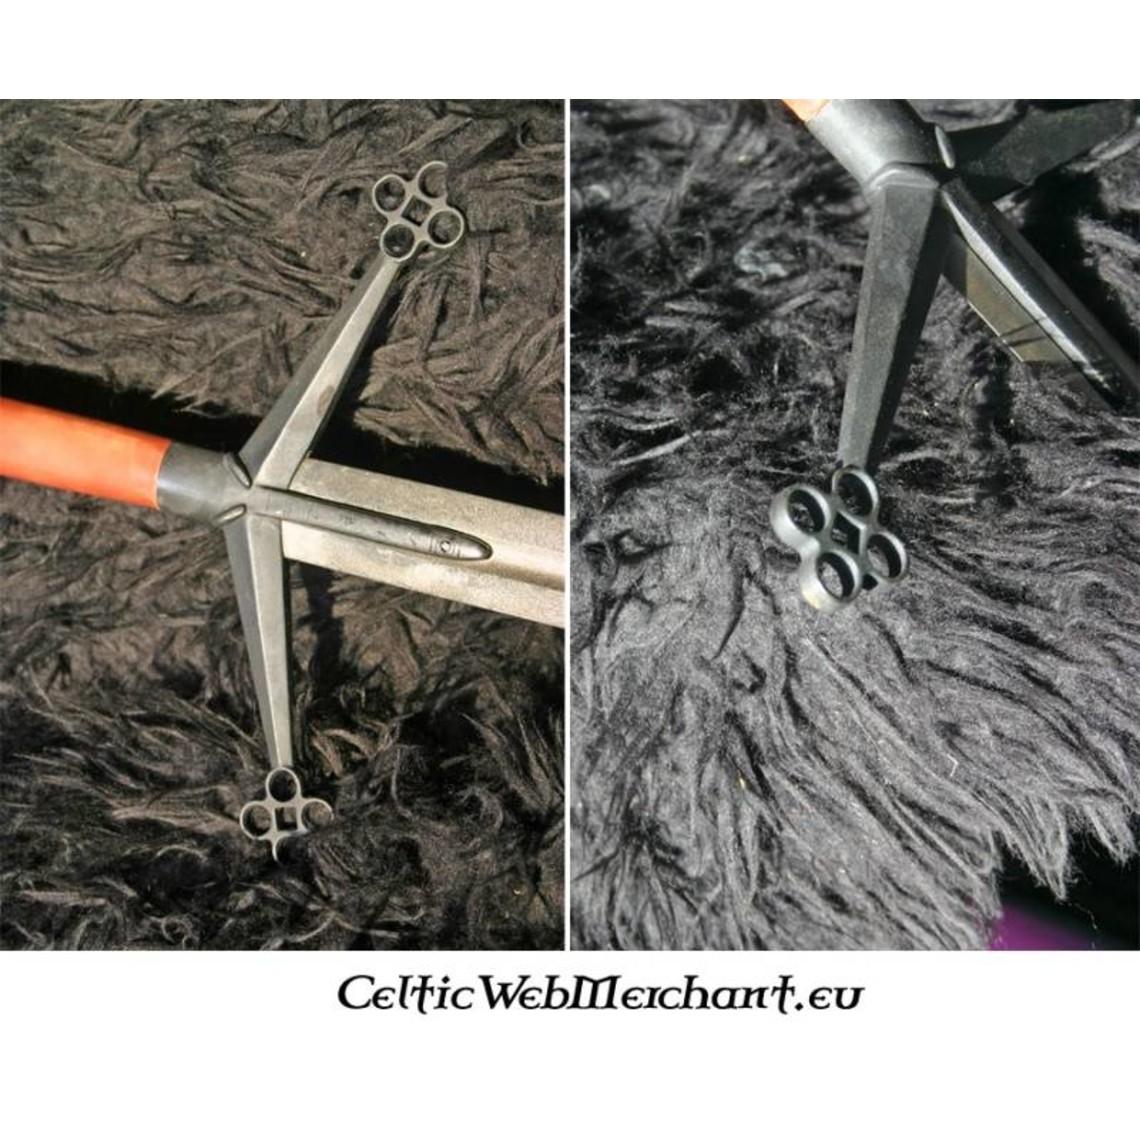 CAS Hanwei Claymore MacDuff envejecida